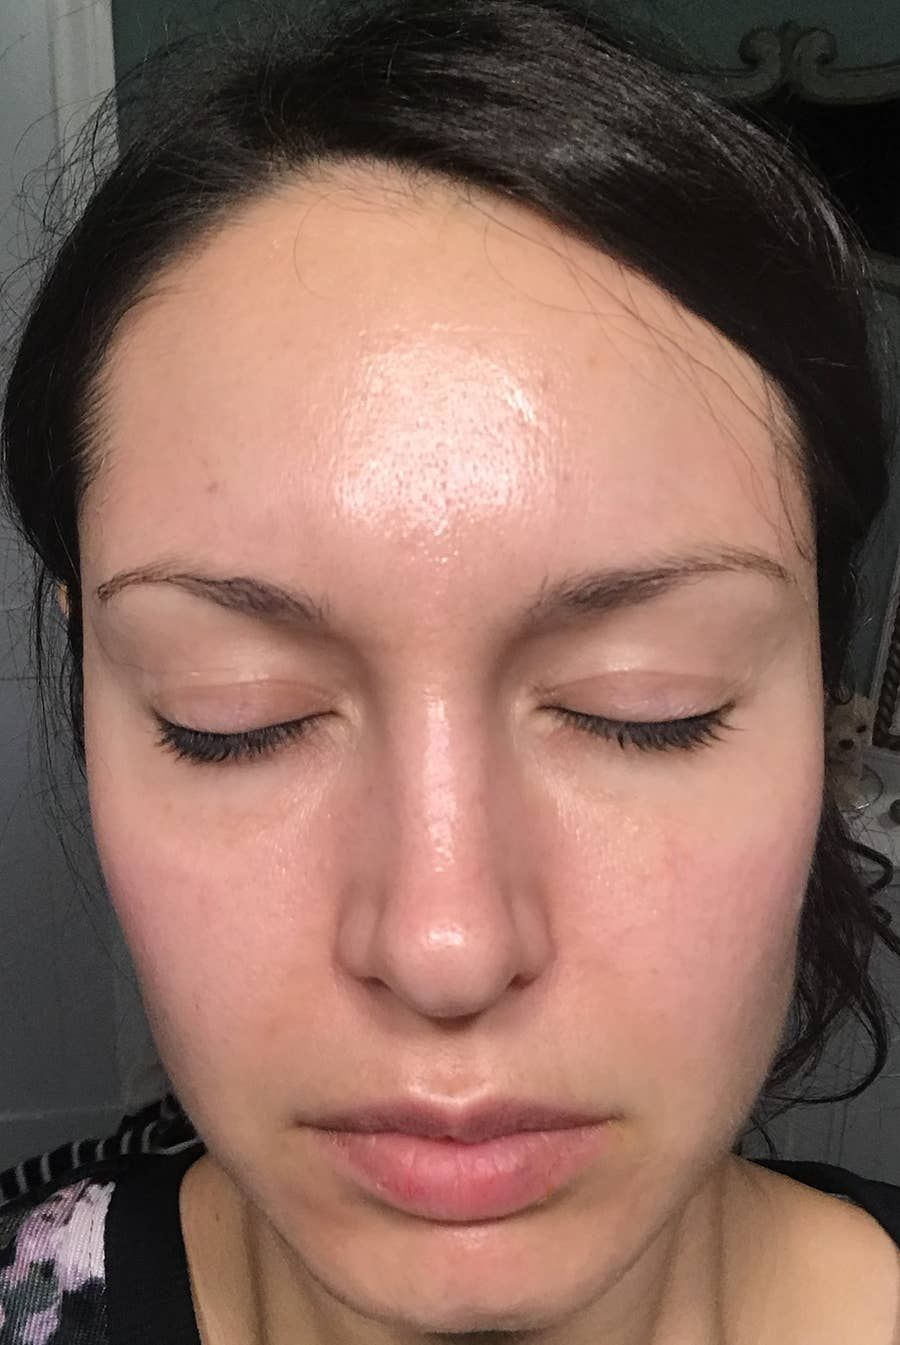 I Tried Jennifer Lopez S Skincare Routine And The Results Were Pretty Dramatic Skin Care Routine Face Cream Jennifer Lopez